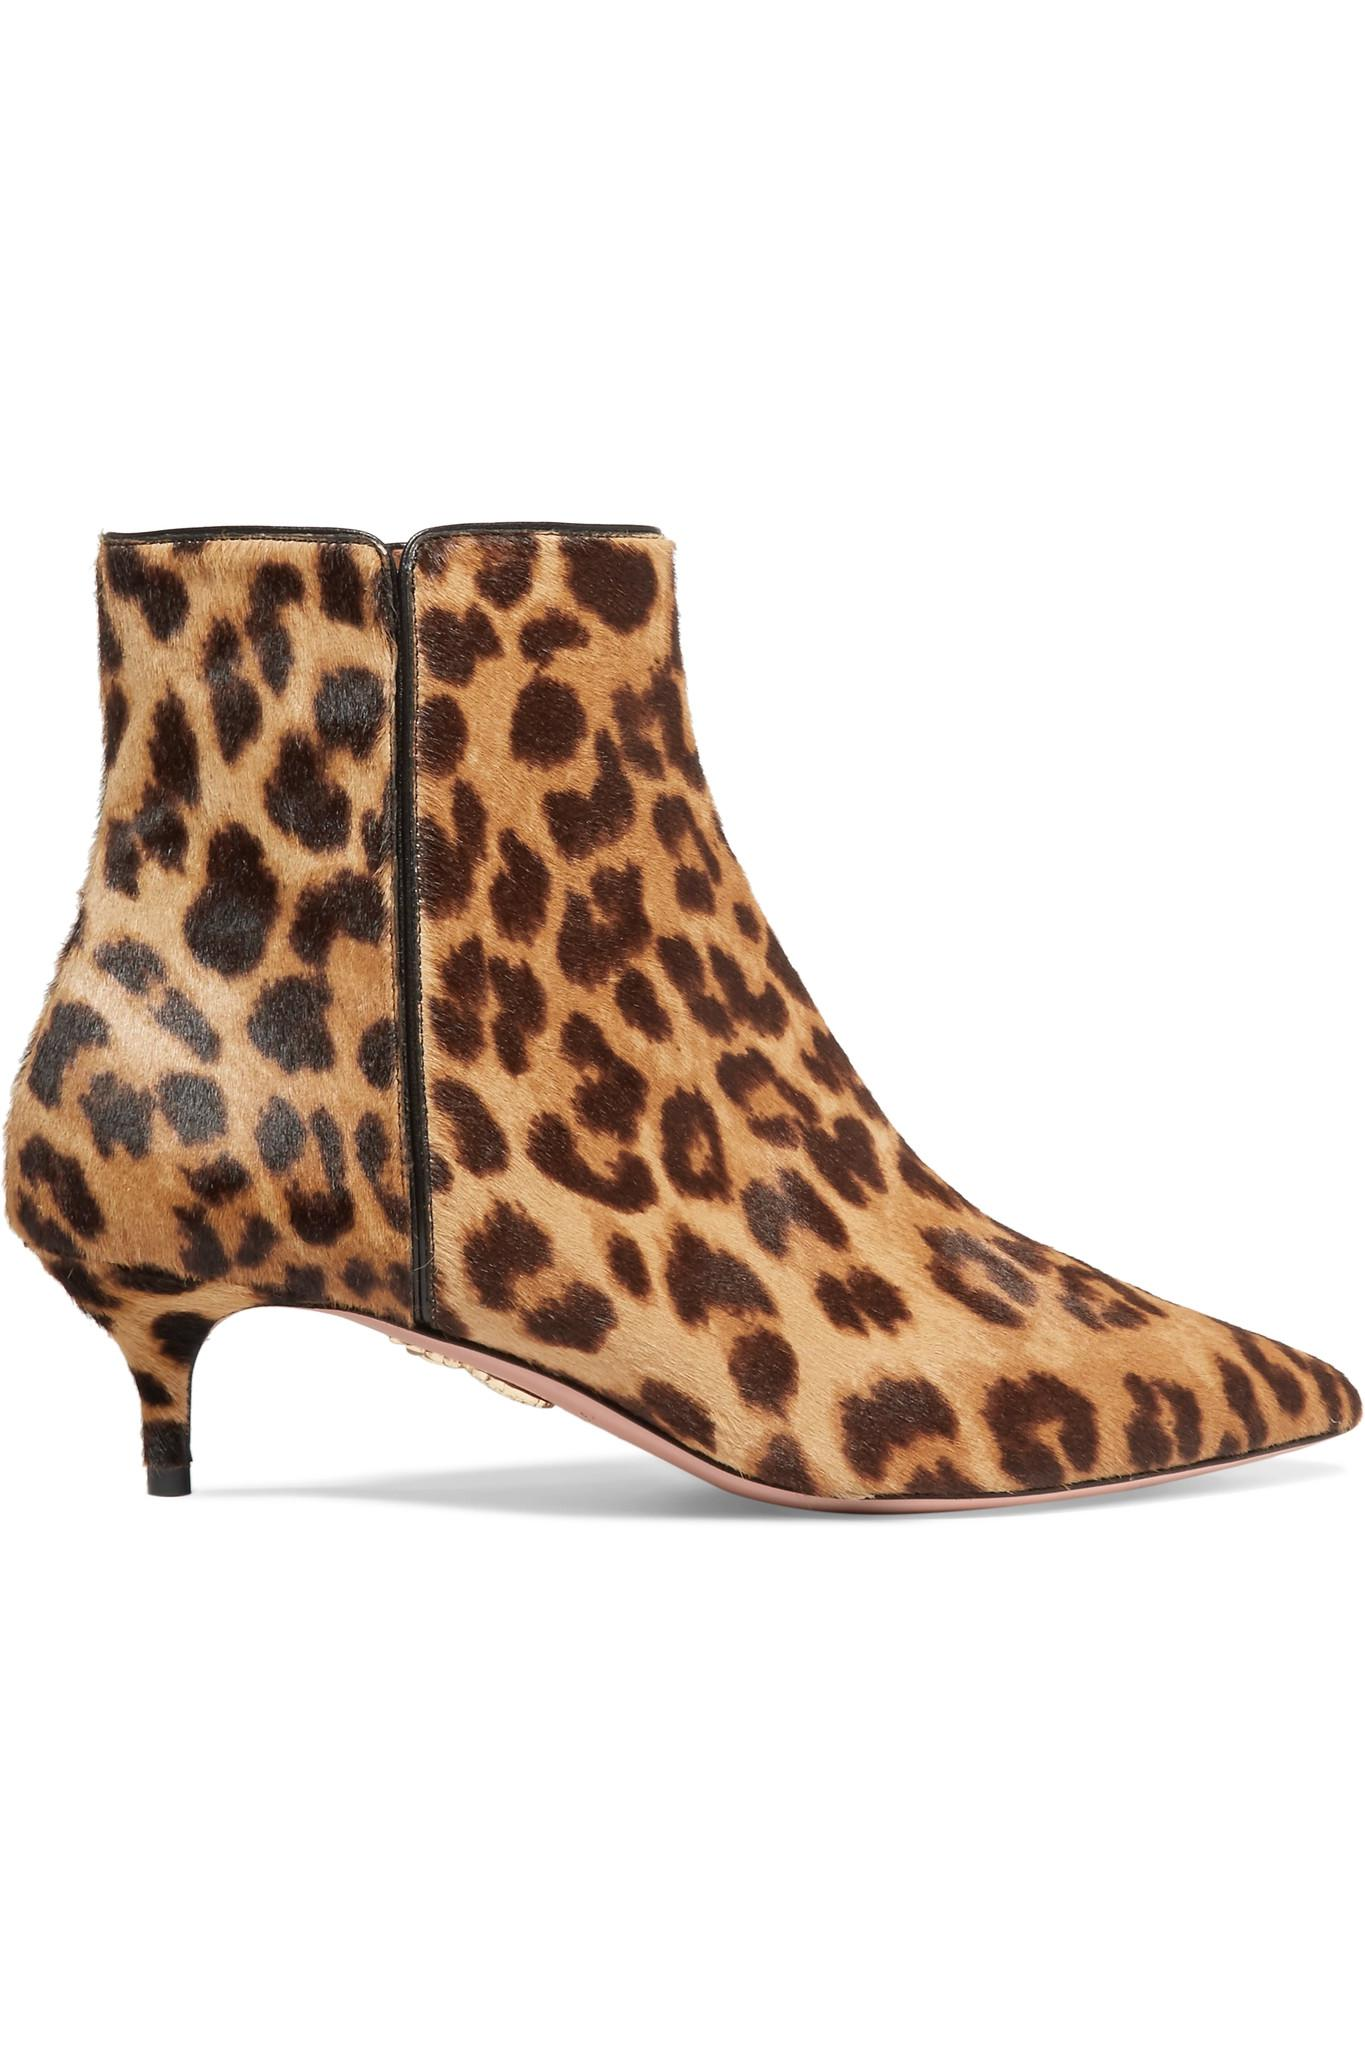 97eb10d62a92 Aquazzura Quant Leopard-print Calf Hair Ankle Boots in Brown - Lyst